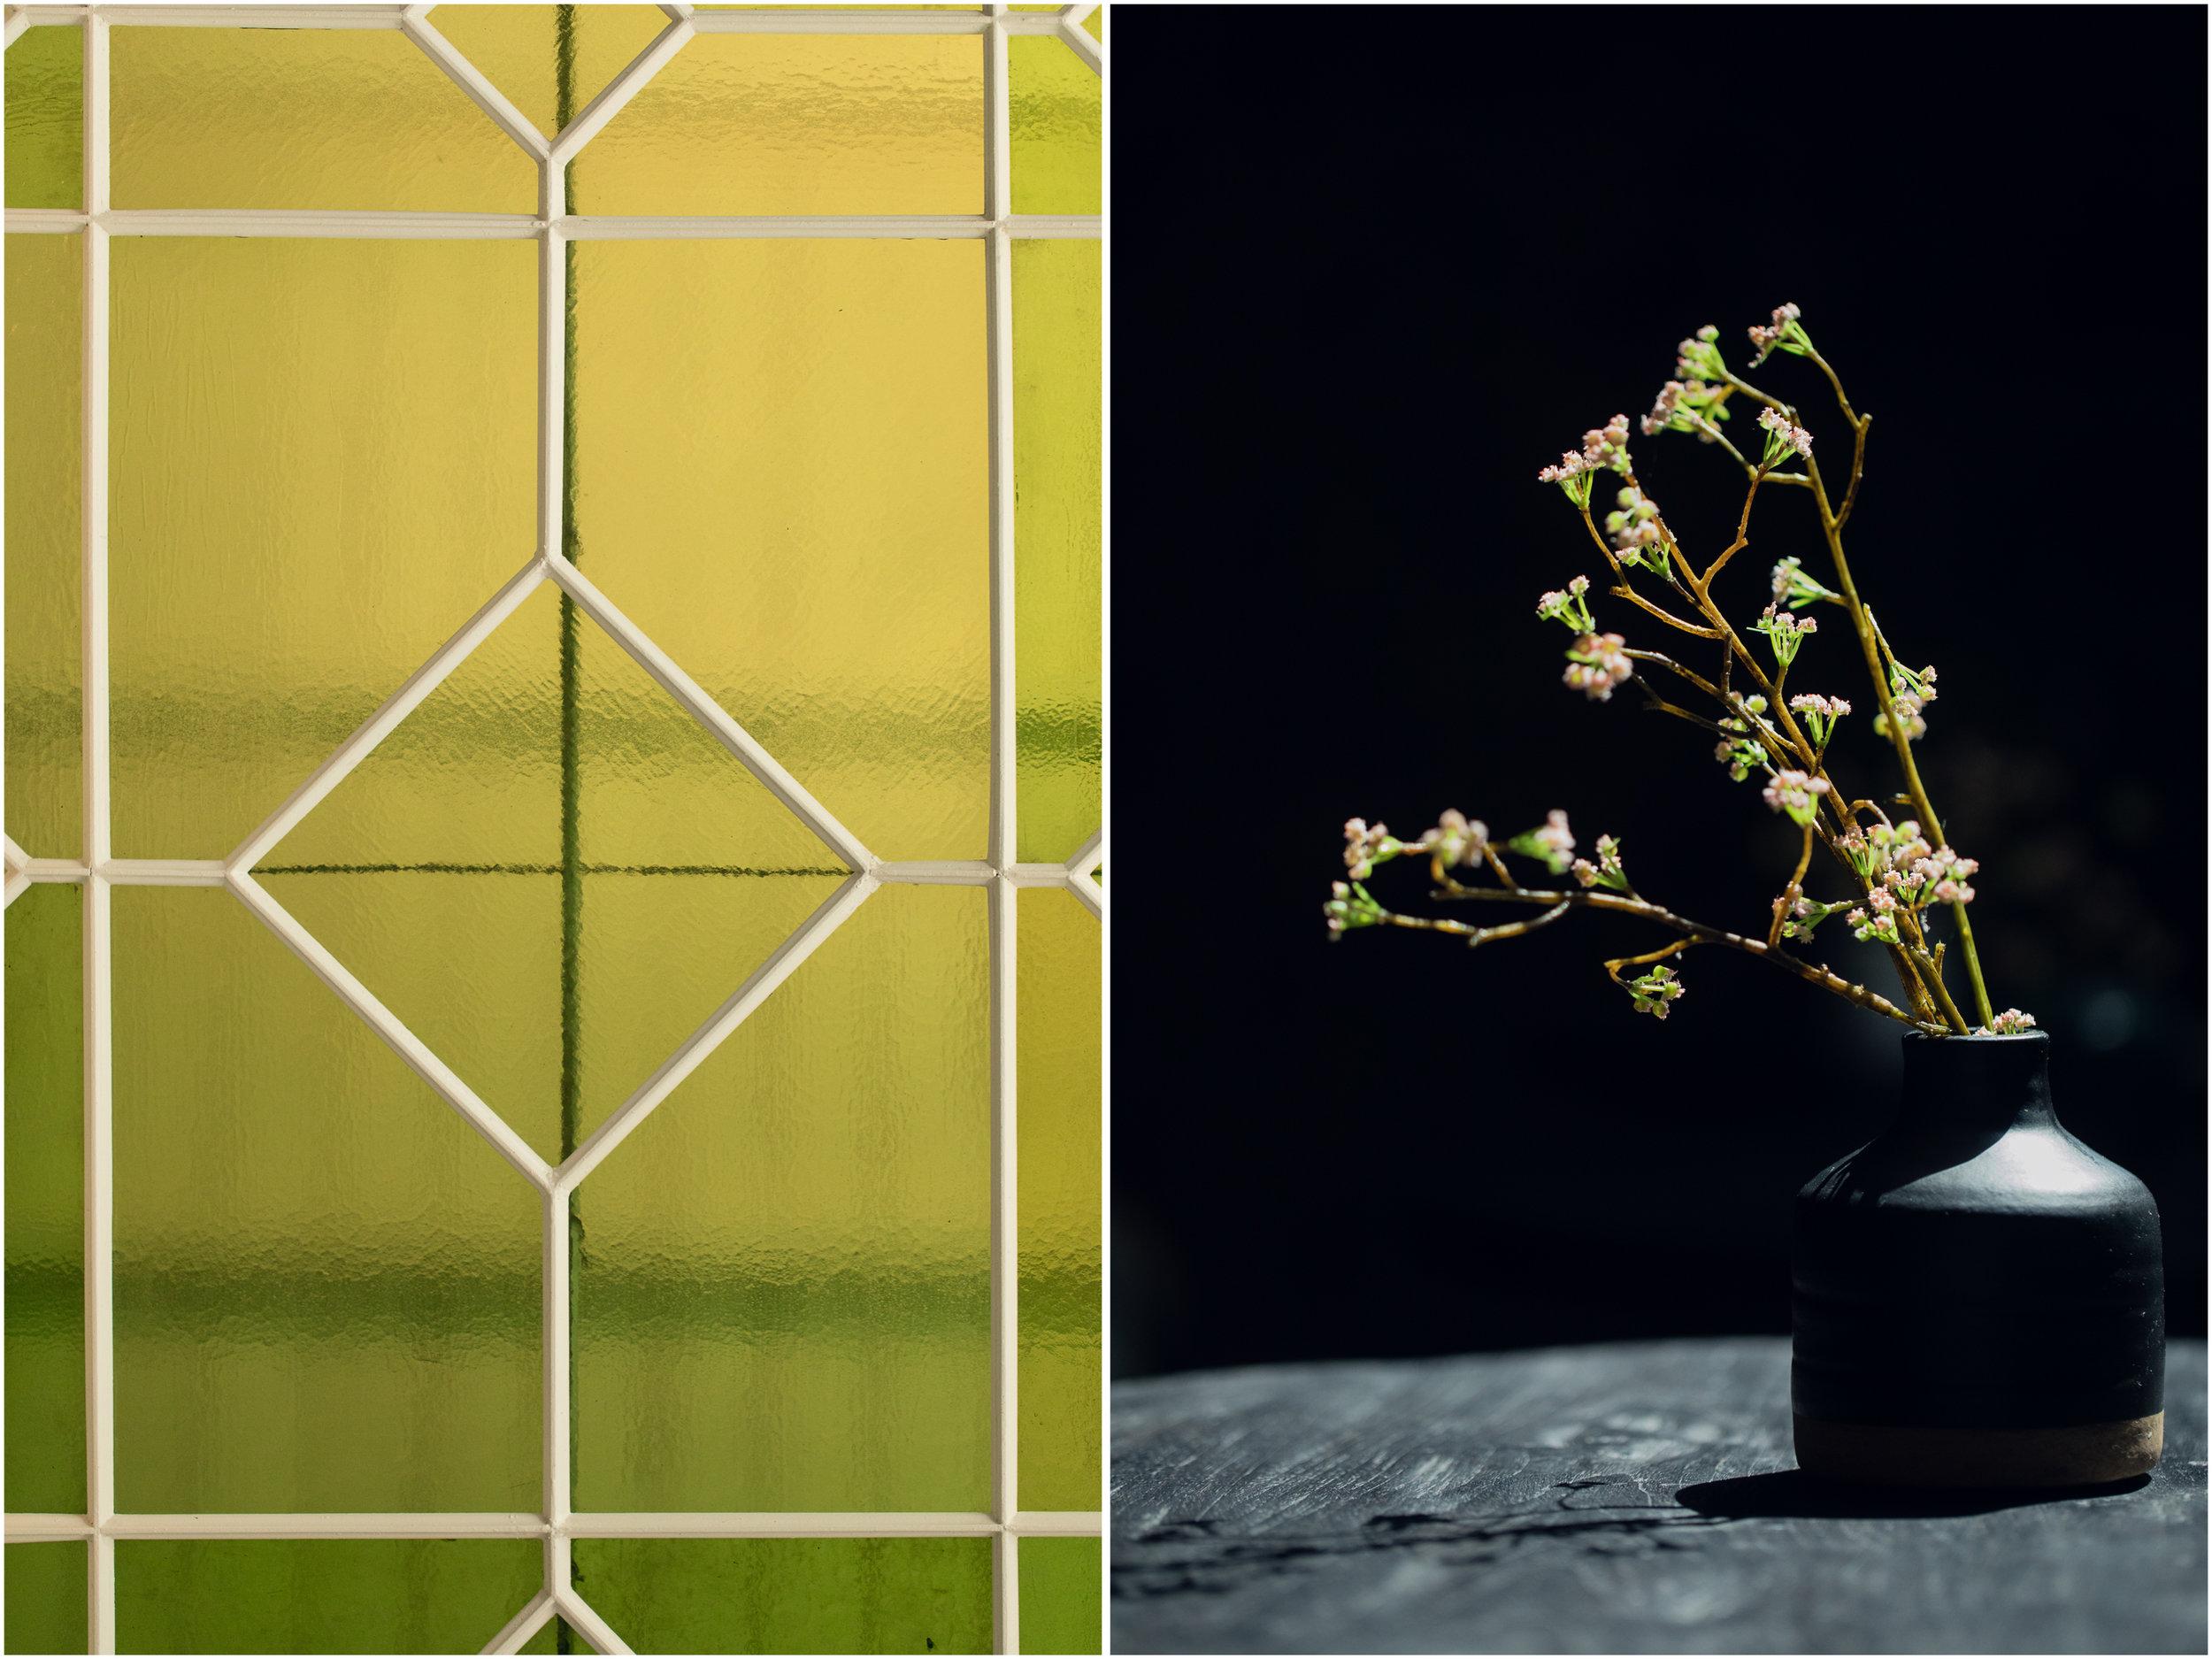 Zakelijke fotografie | Evenementen fotografie | ARTRA